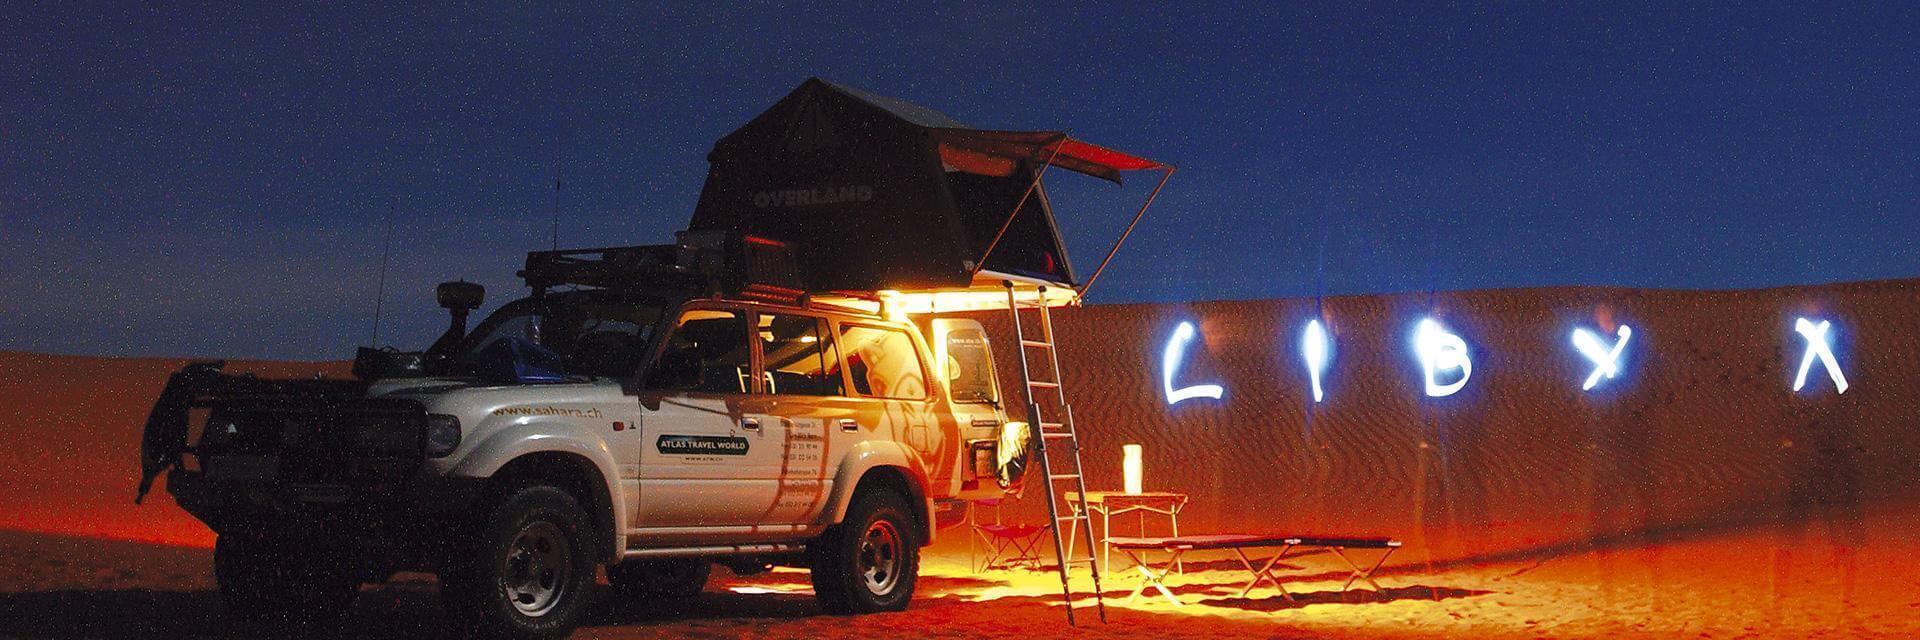 Autohome Dachzelt - Overland Roof Top Tents